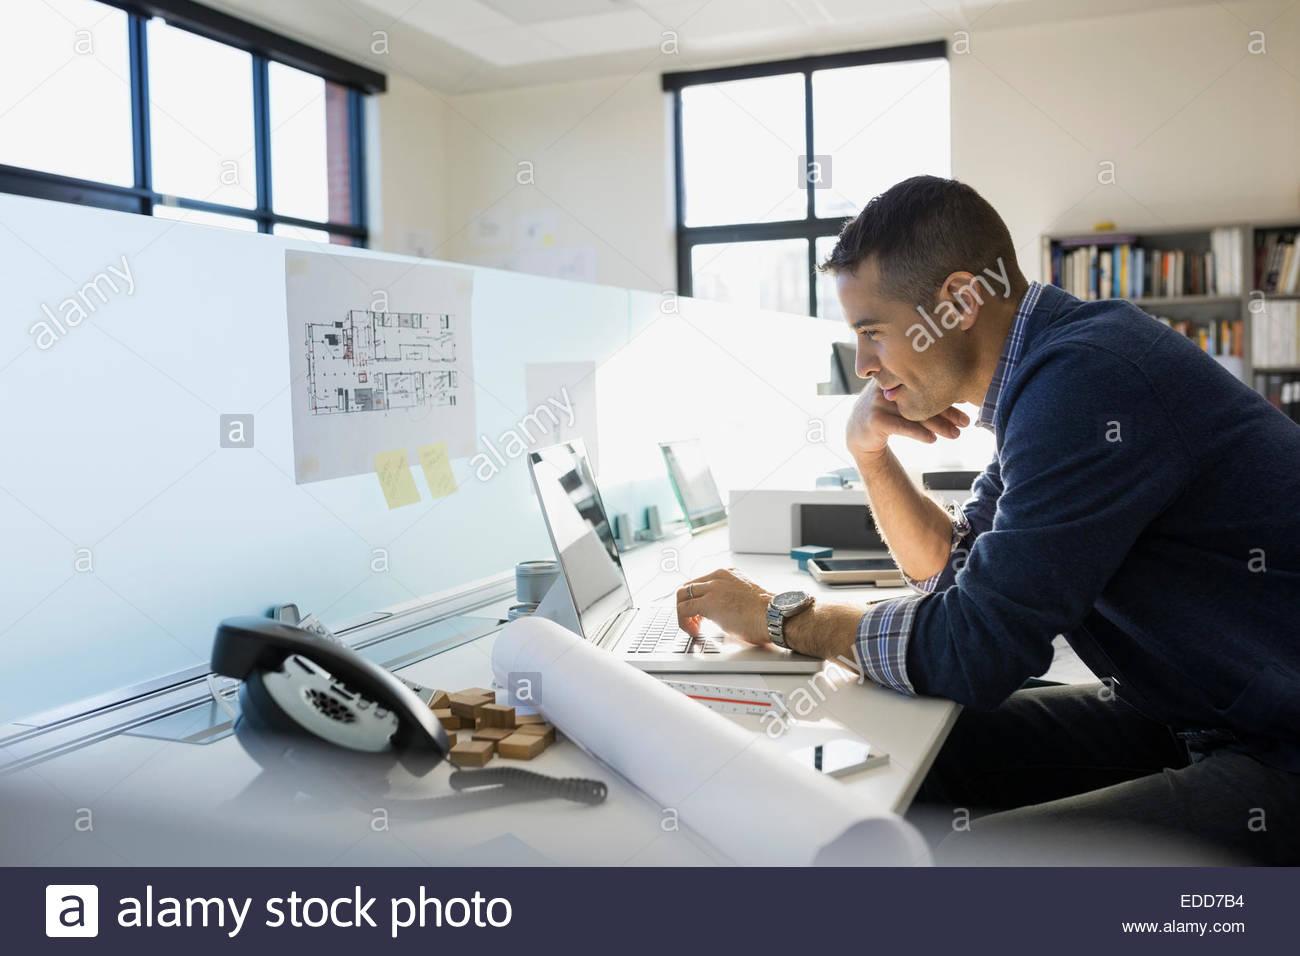 Architekten arbeiten am Laptop im Büro Stockbild